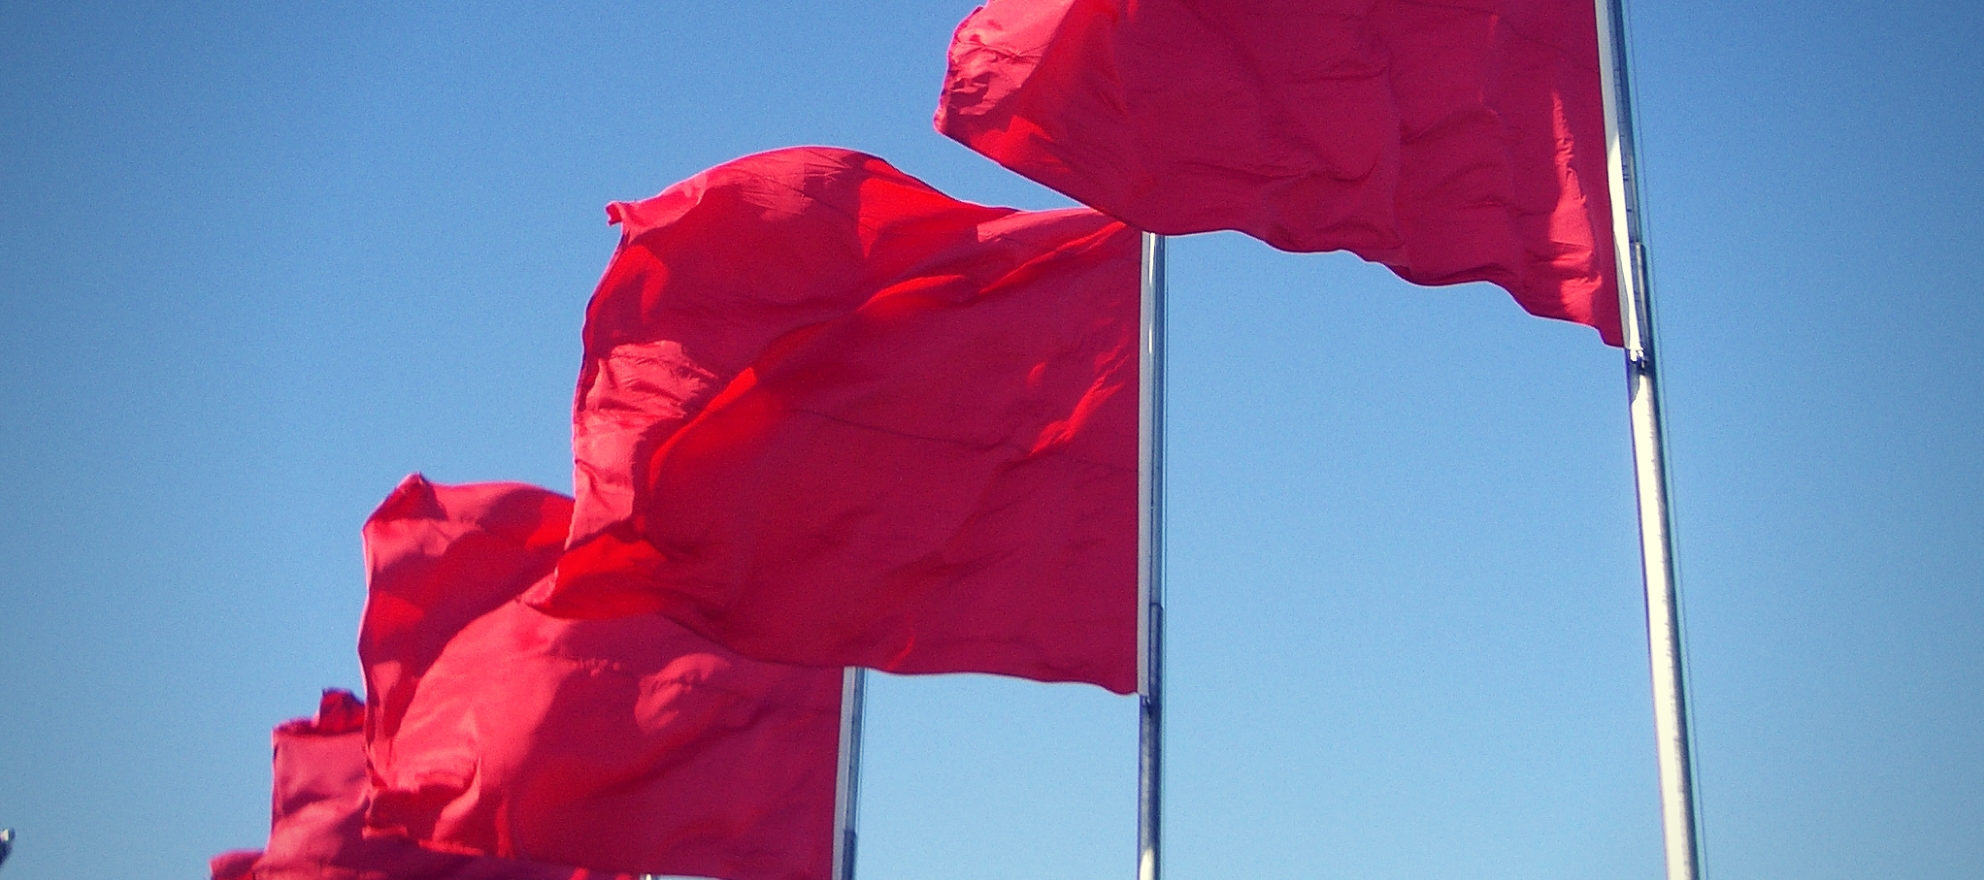 Brokers beware: 9 recruiting red flags